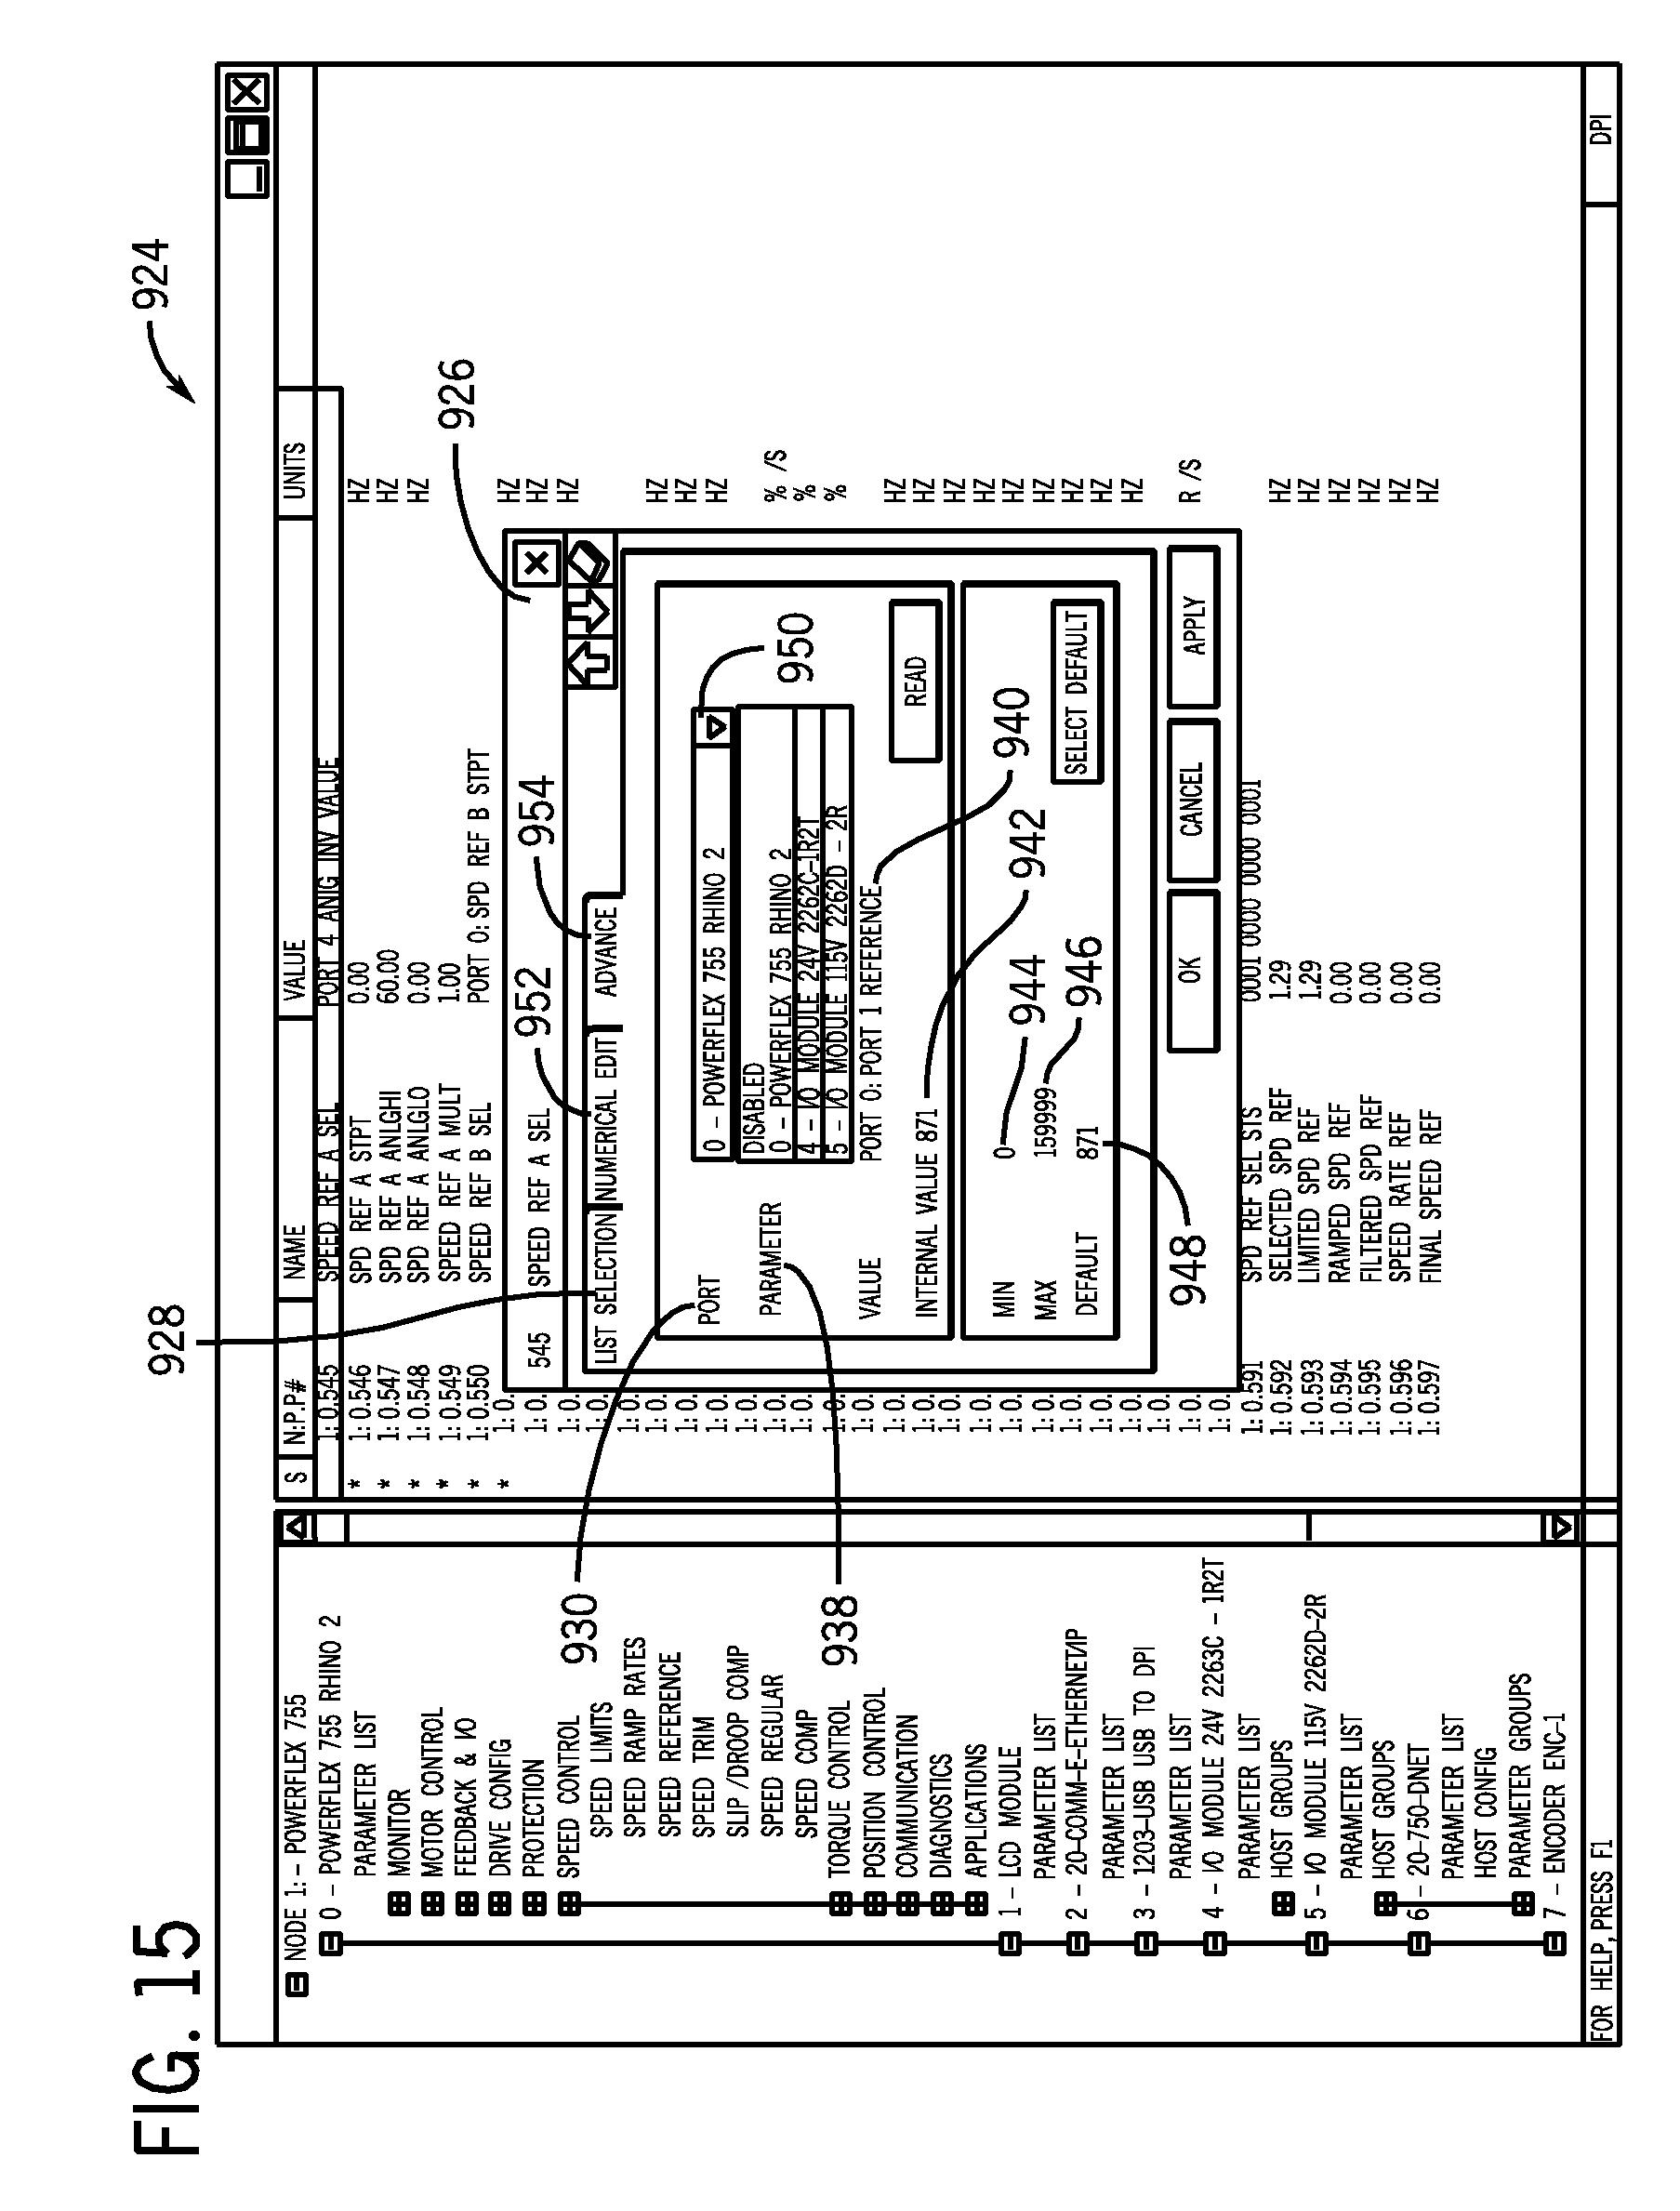 Ab Powerflex 755 Wiring Diagram Online Wiring Diagram